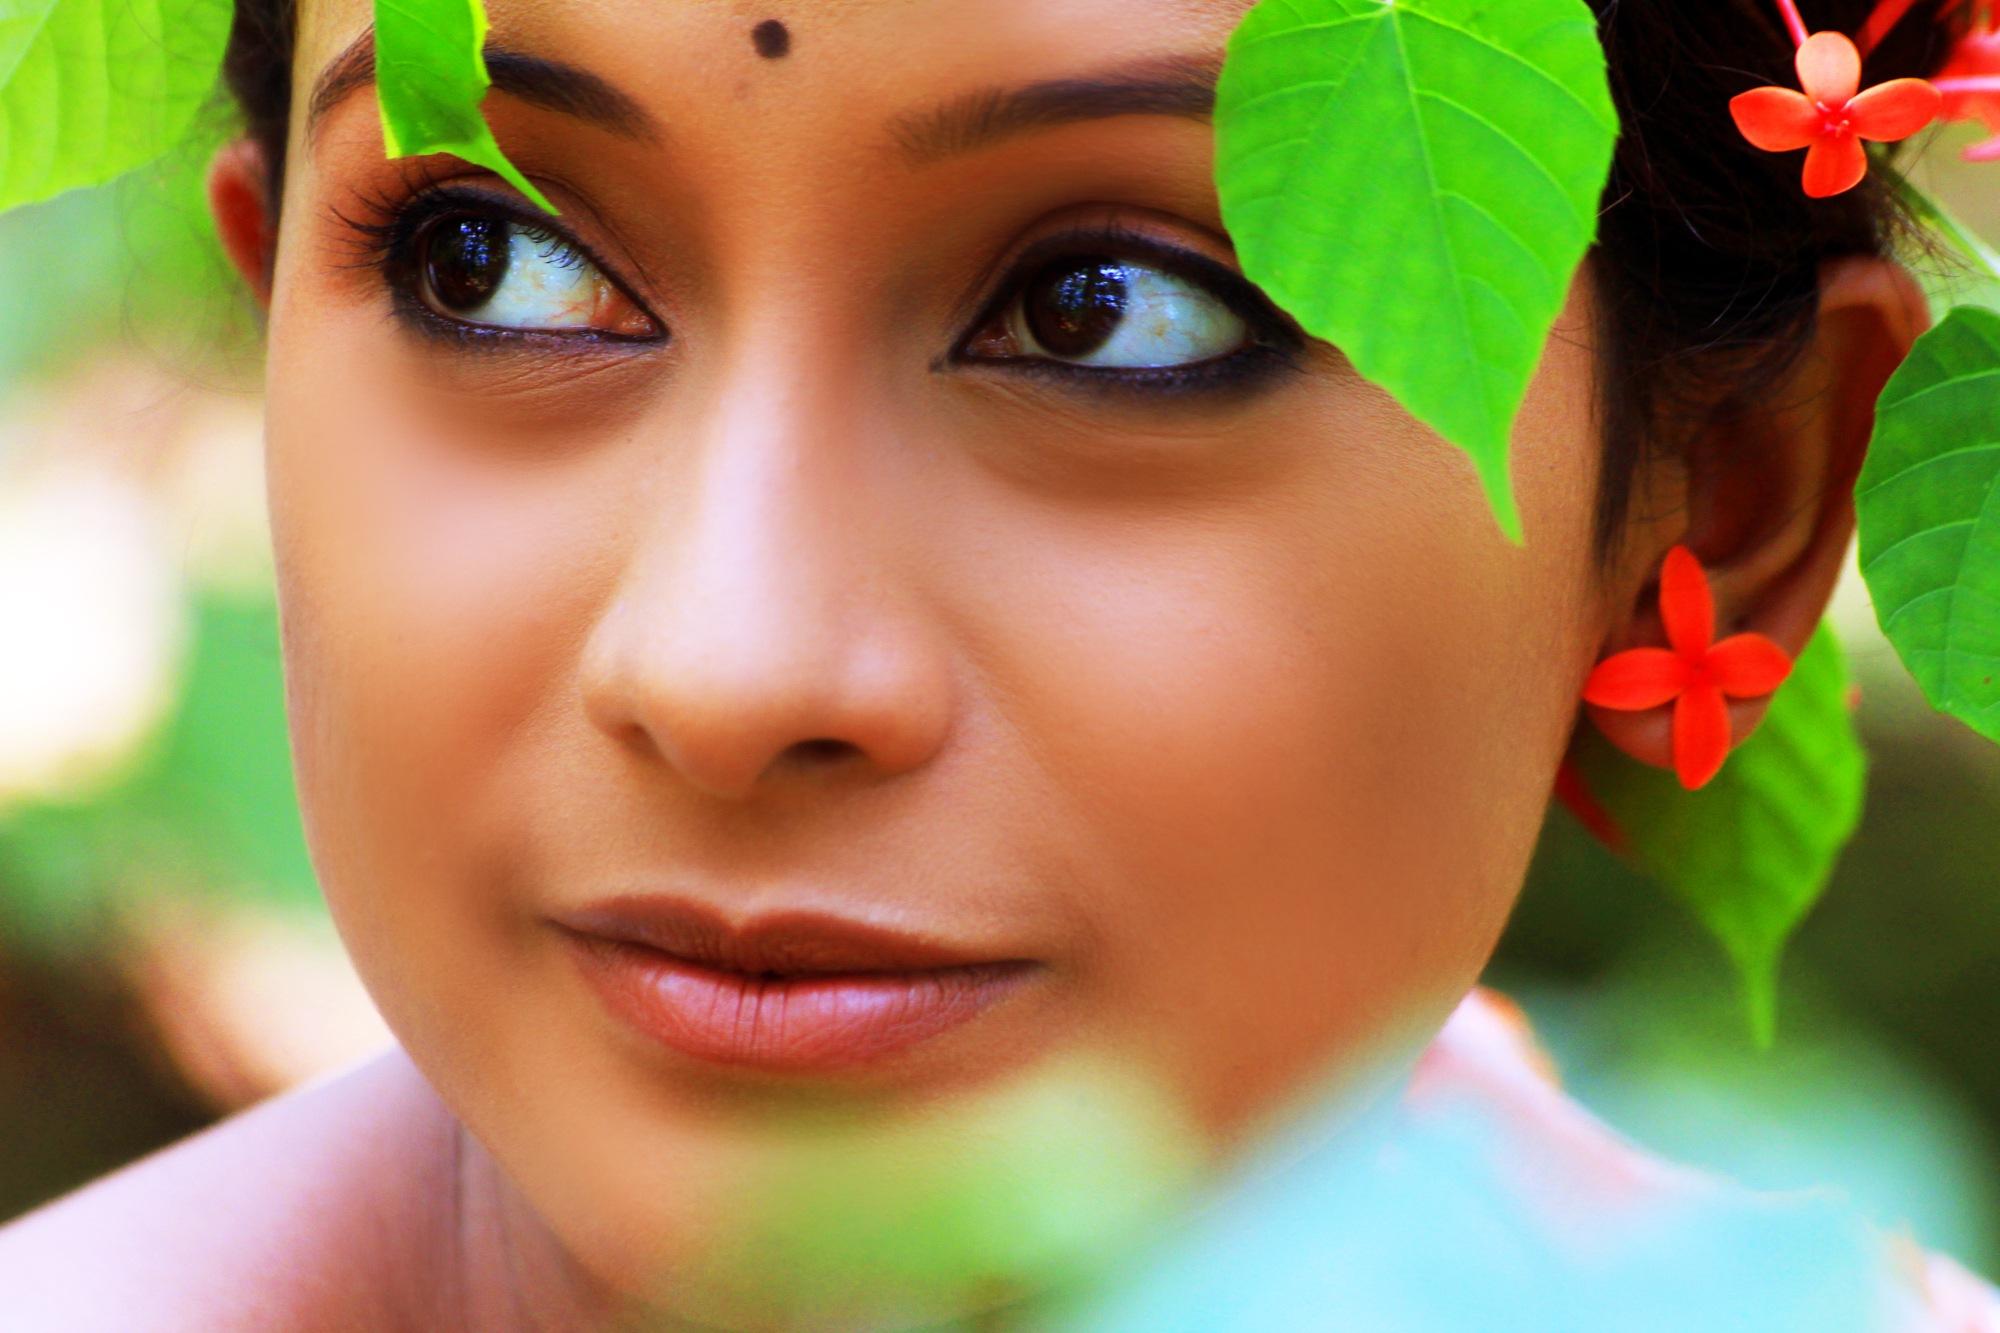 Untitled by hossainatahar